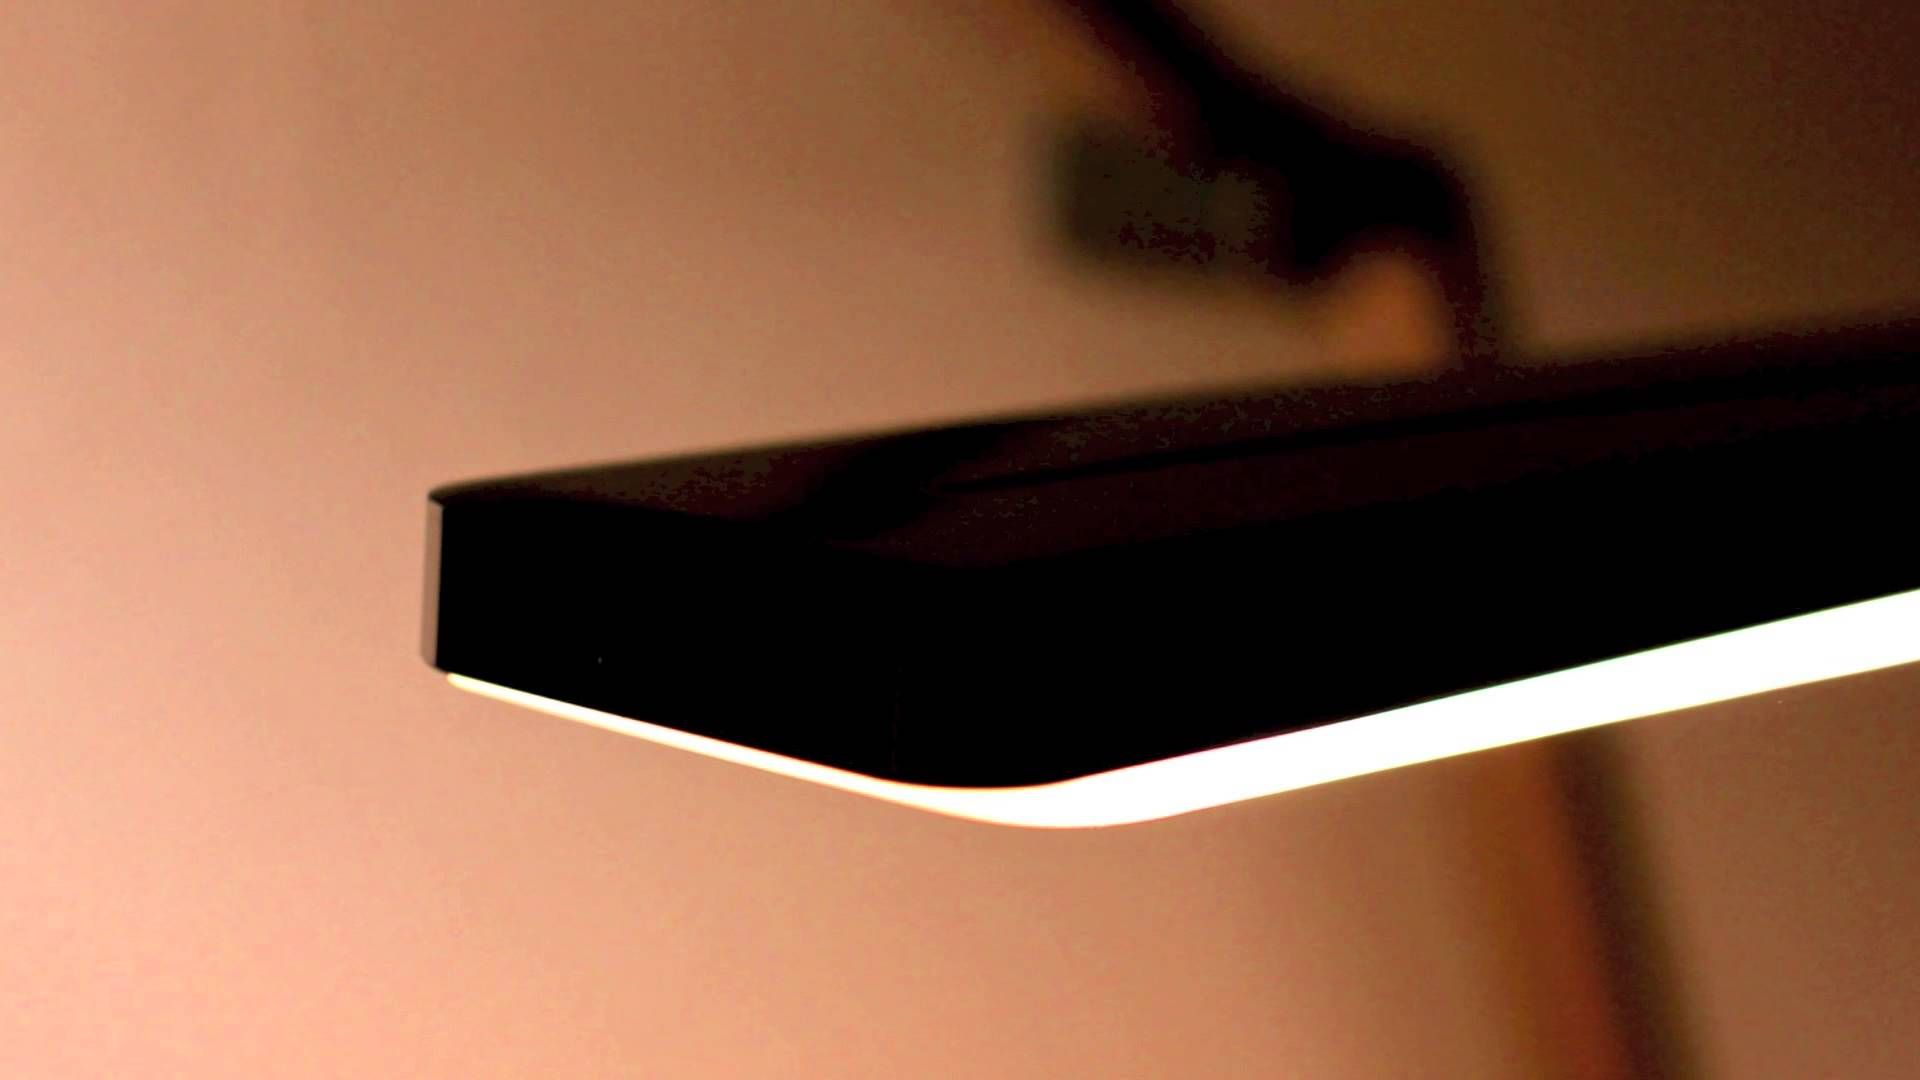 Tremendous Lightblade 1500 Led Desk Lamp By Lumiy Lumiy Lightblade Download Free Architecture Designs Philgrimeyleaguecom